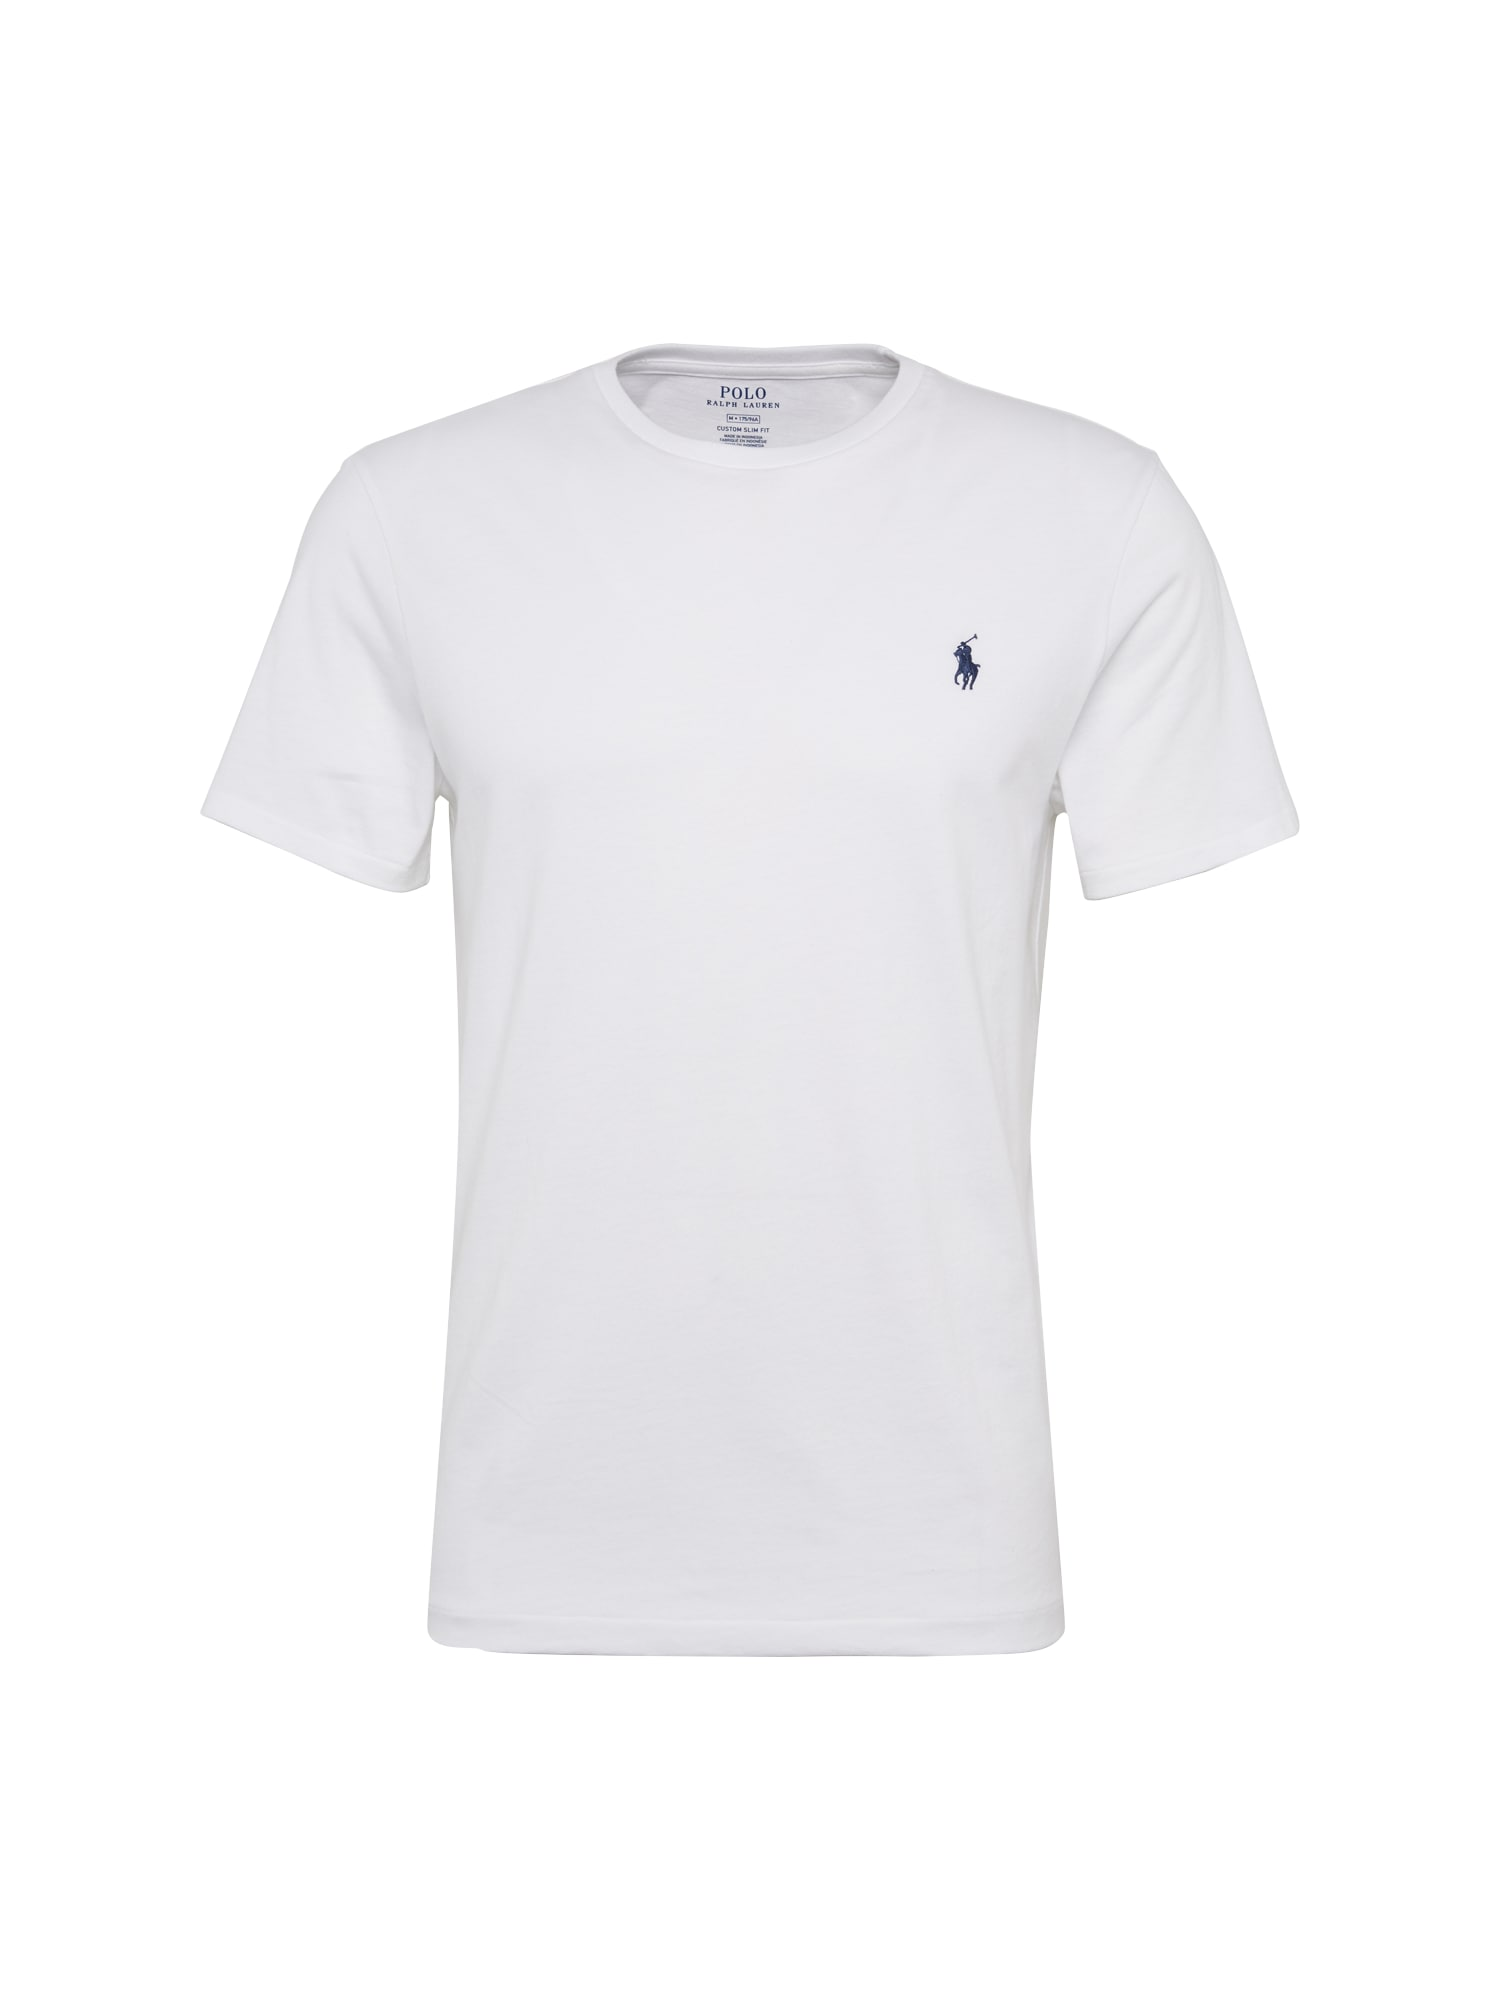 POLO RALPH LAUREN Marškinėliai 'SSCNM2-SHORT SLEEVE-T-SHIRT' balta